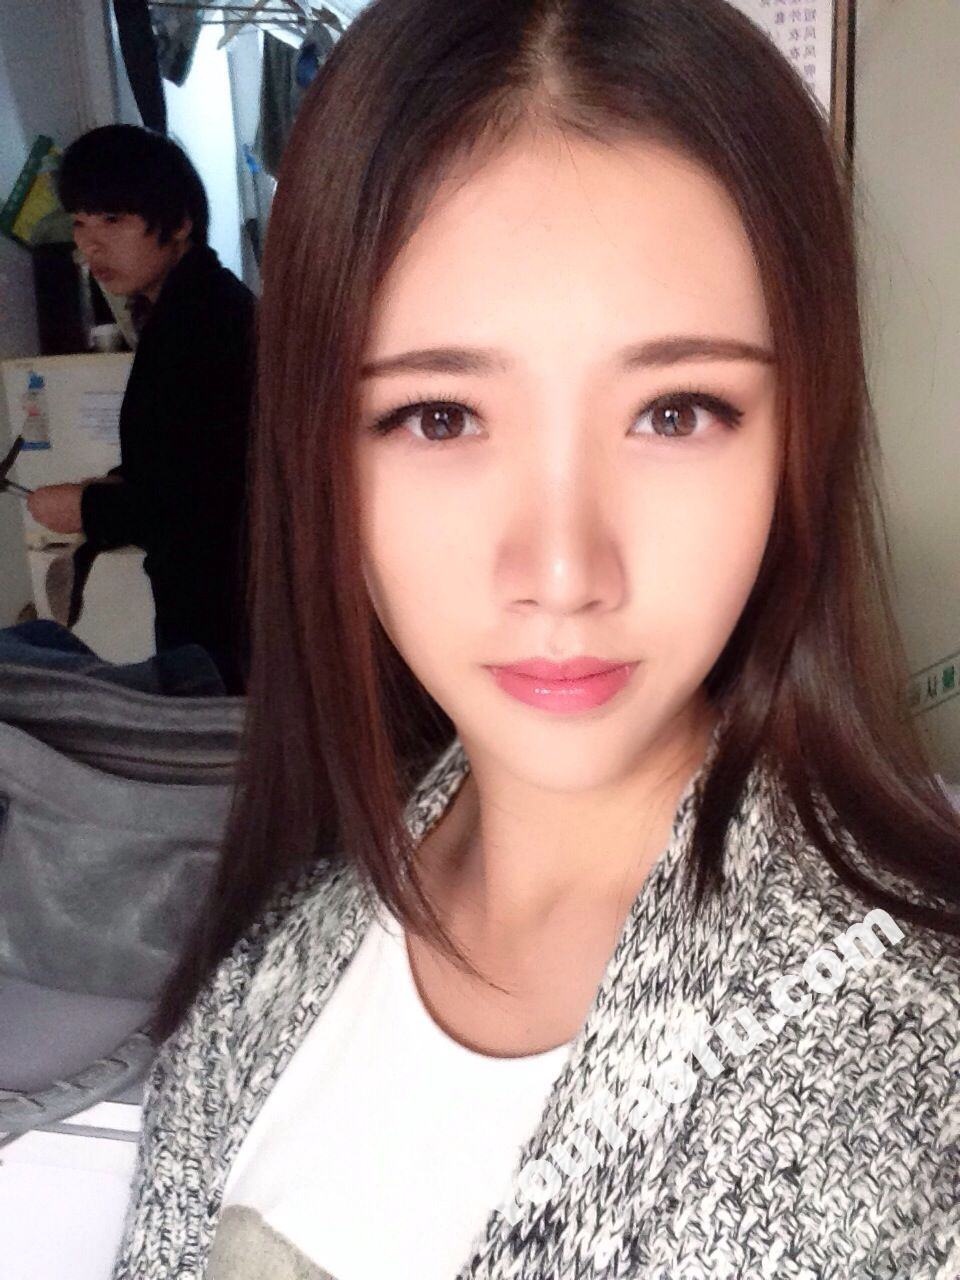 KK58_129张 真实美女时尚女神套图生活照-6